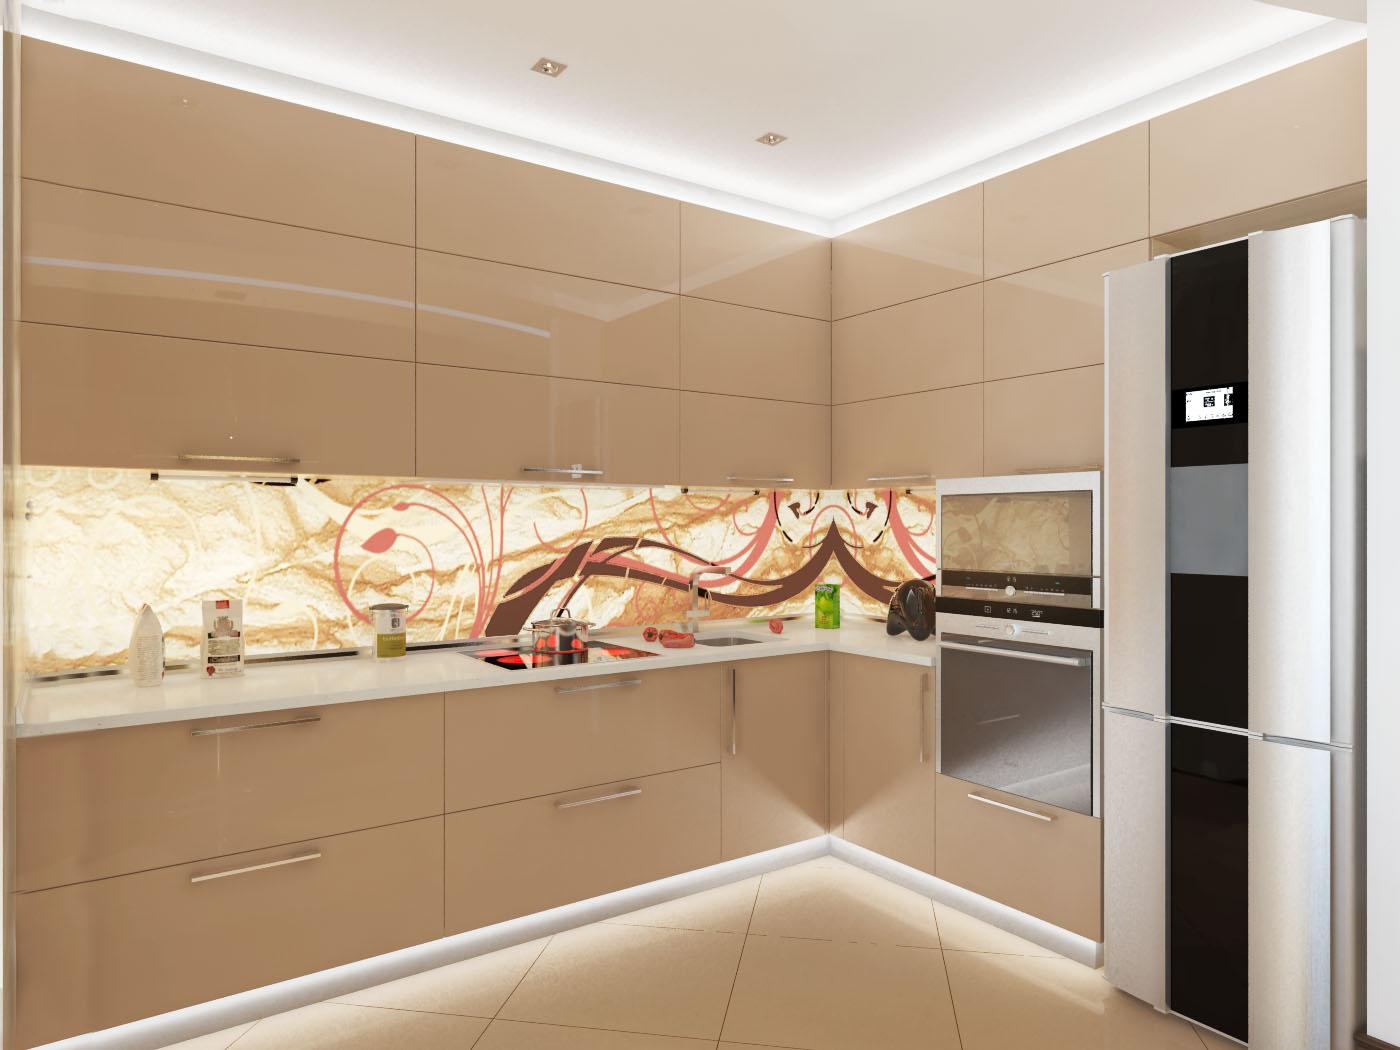 Бежевая кухня с фасадом из пластика